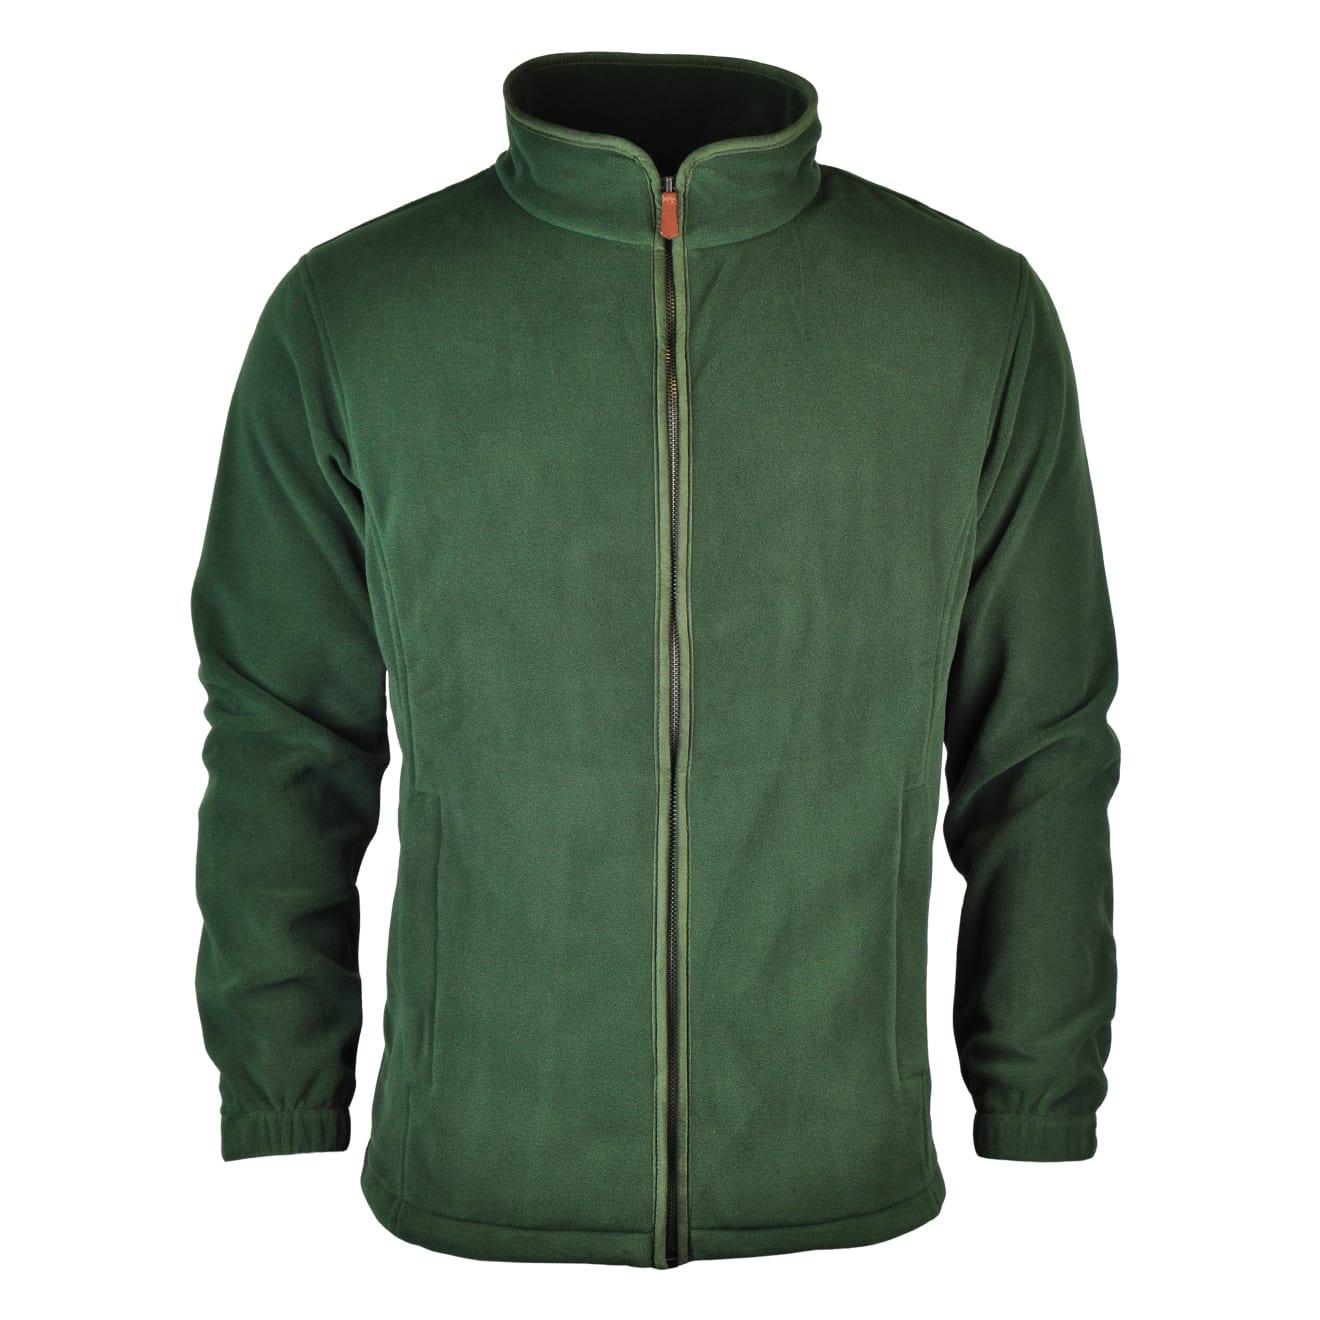 James Purdey Lightweight Fleece Jacket Green